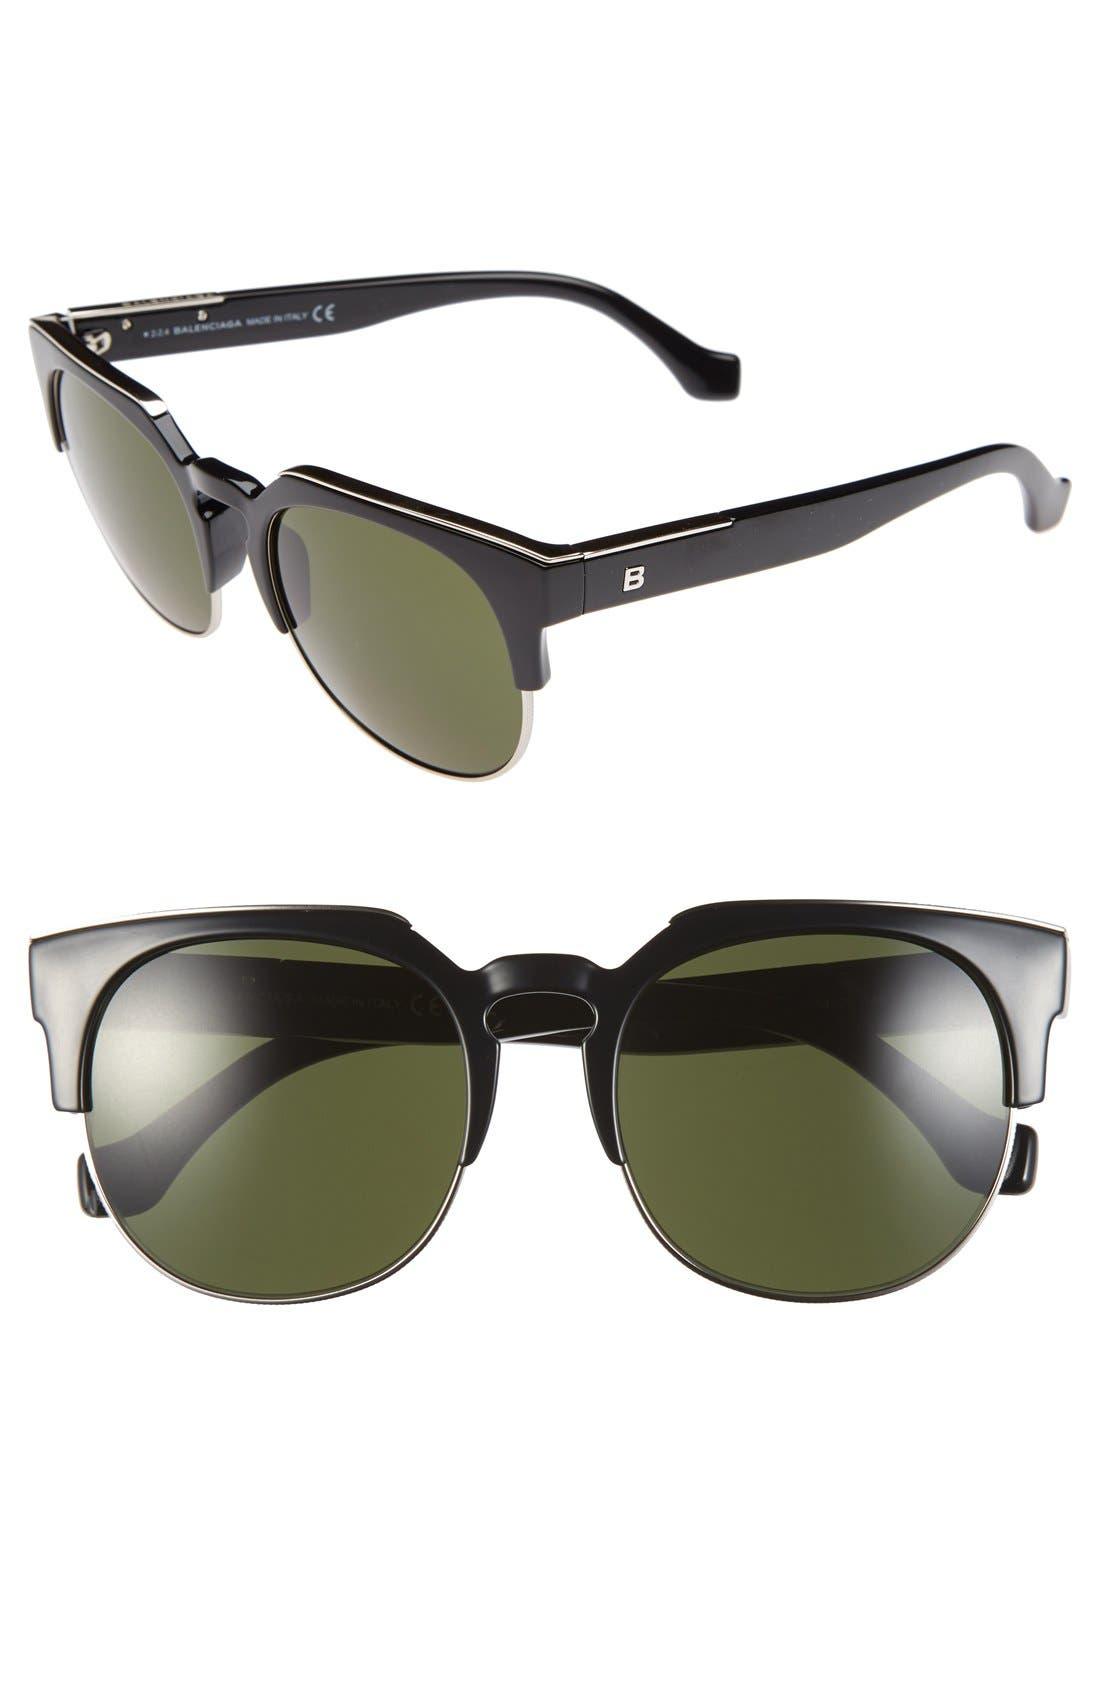 Main Image - Balenciaga Paris 54mm Sunglasses